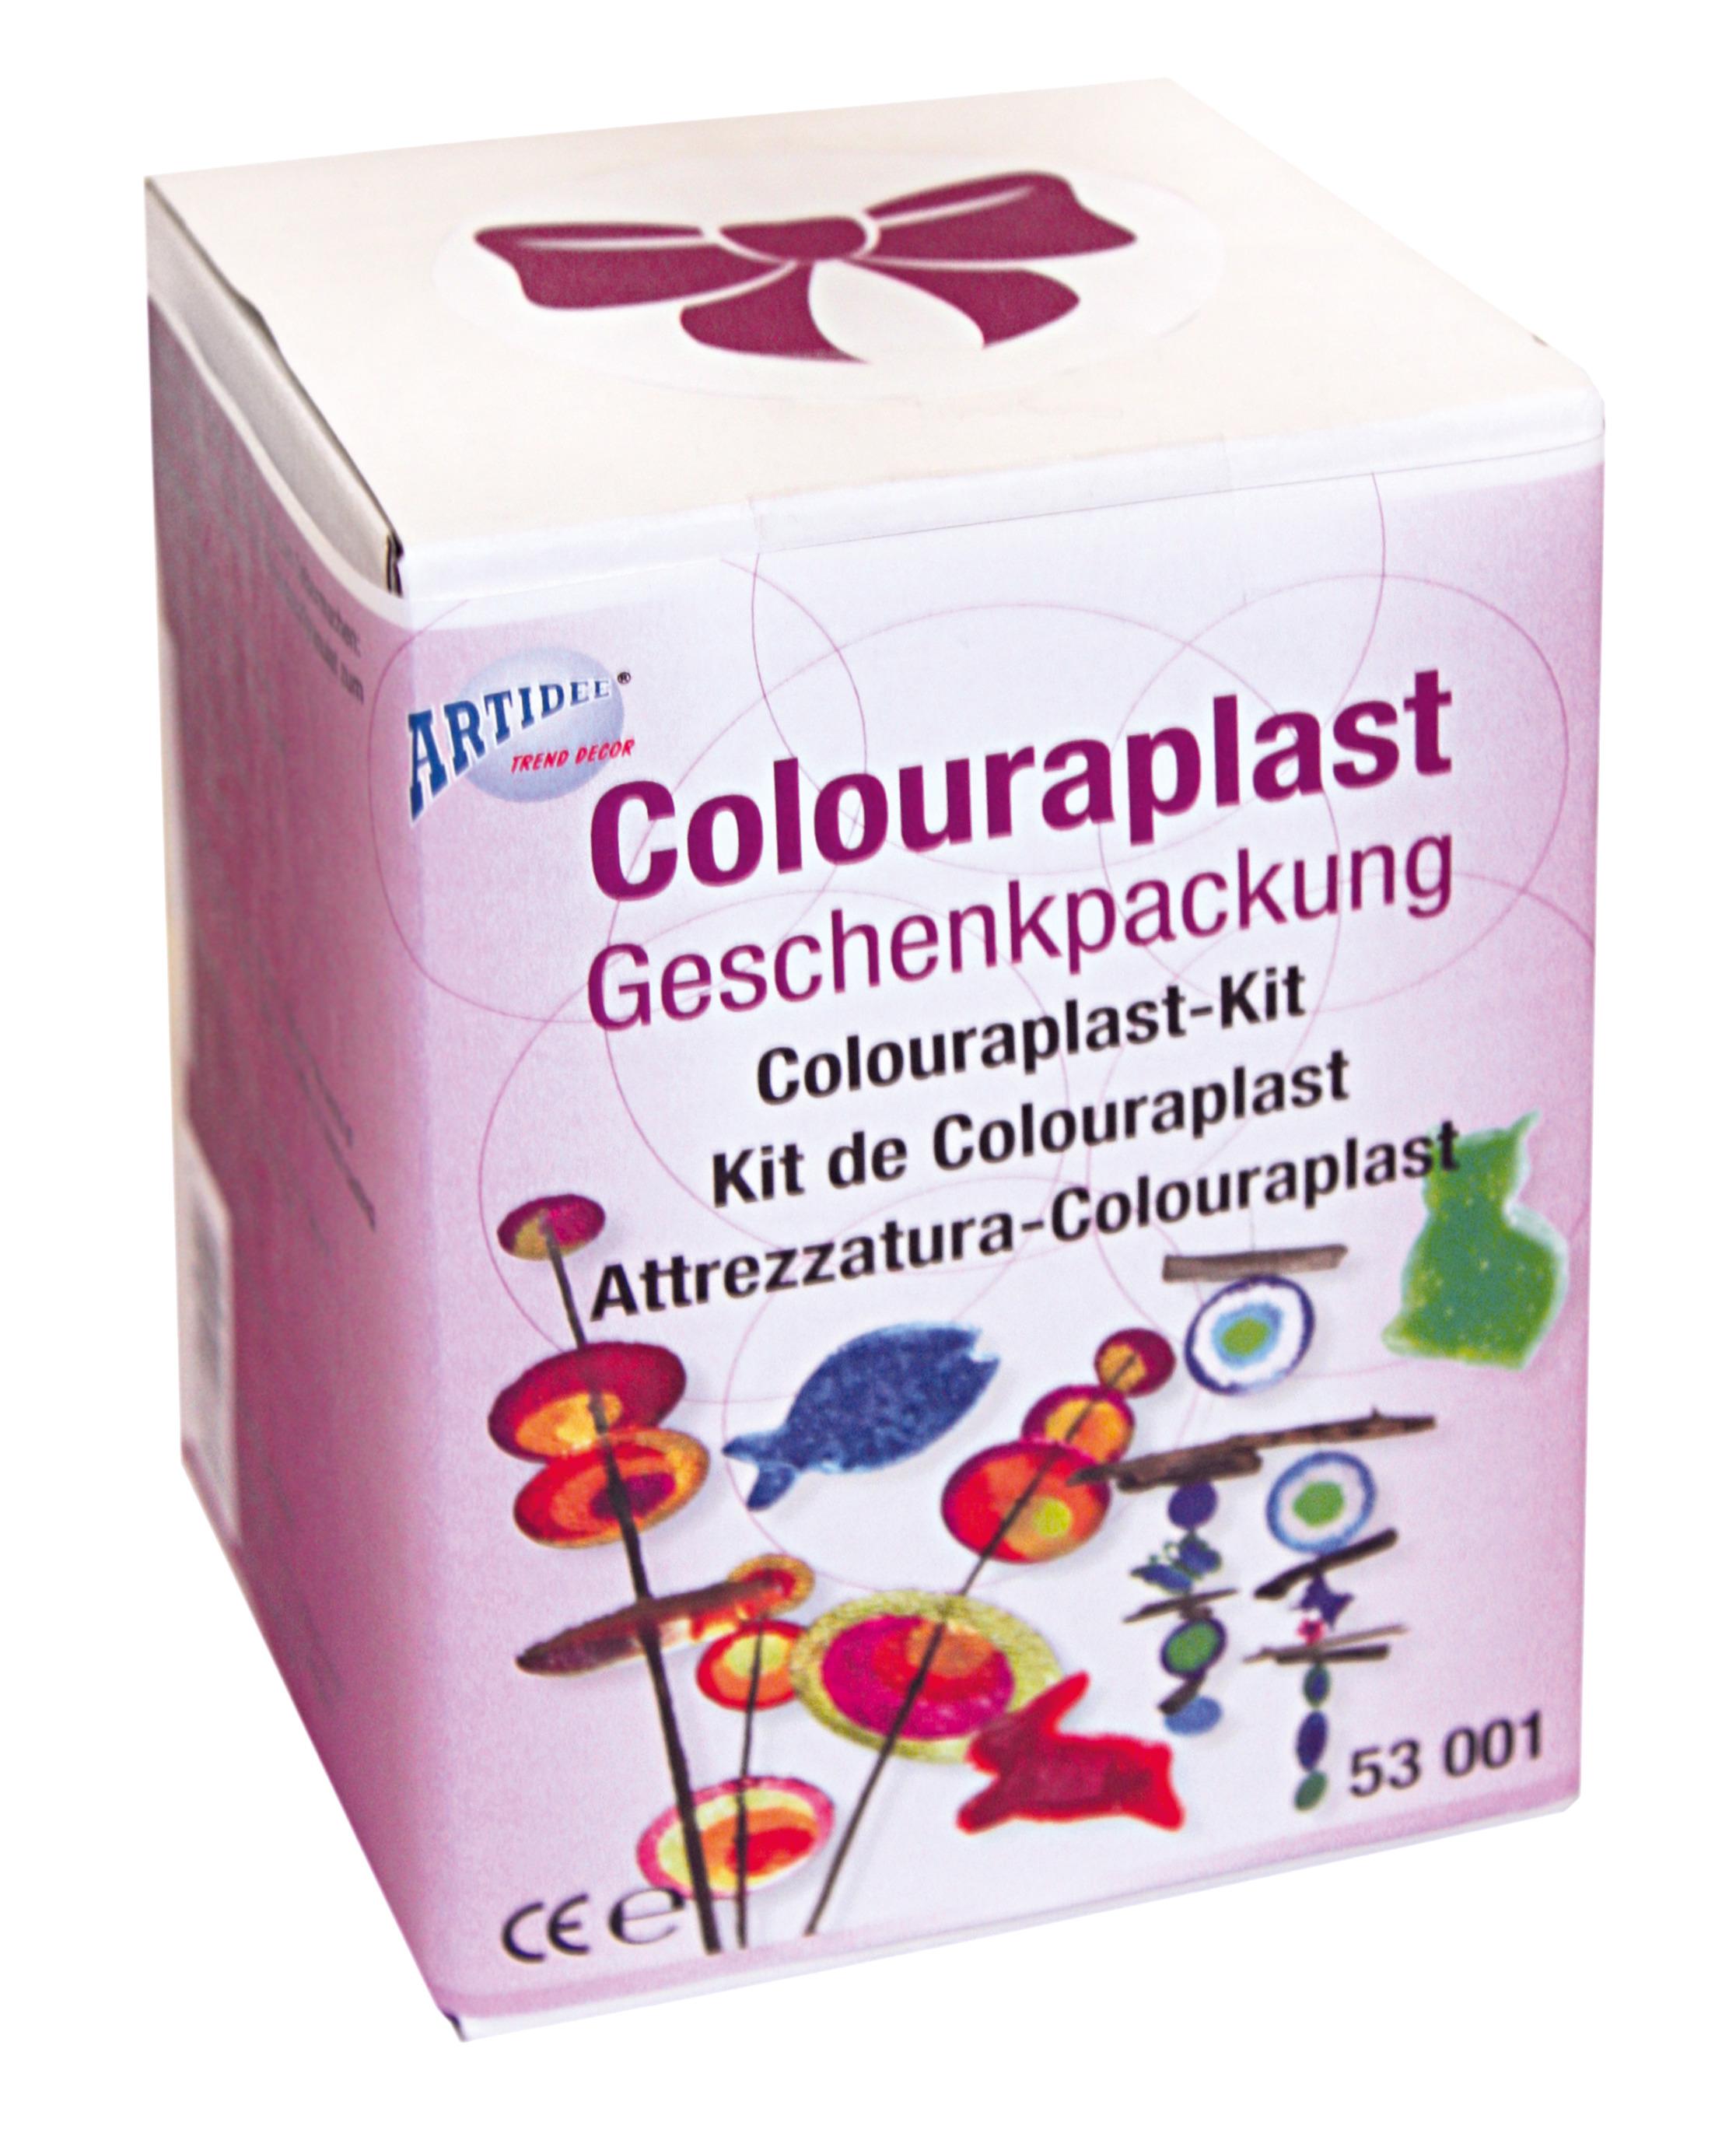 Colouraplast Geschenkpackung